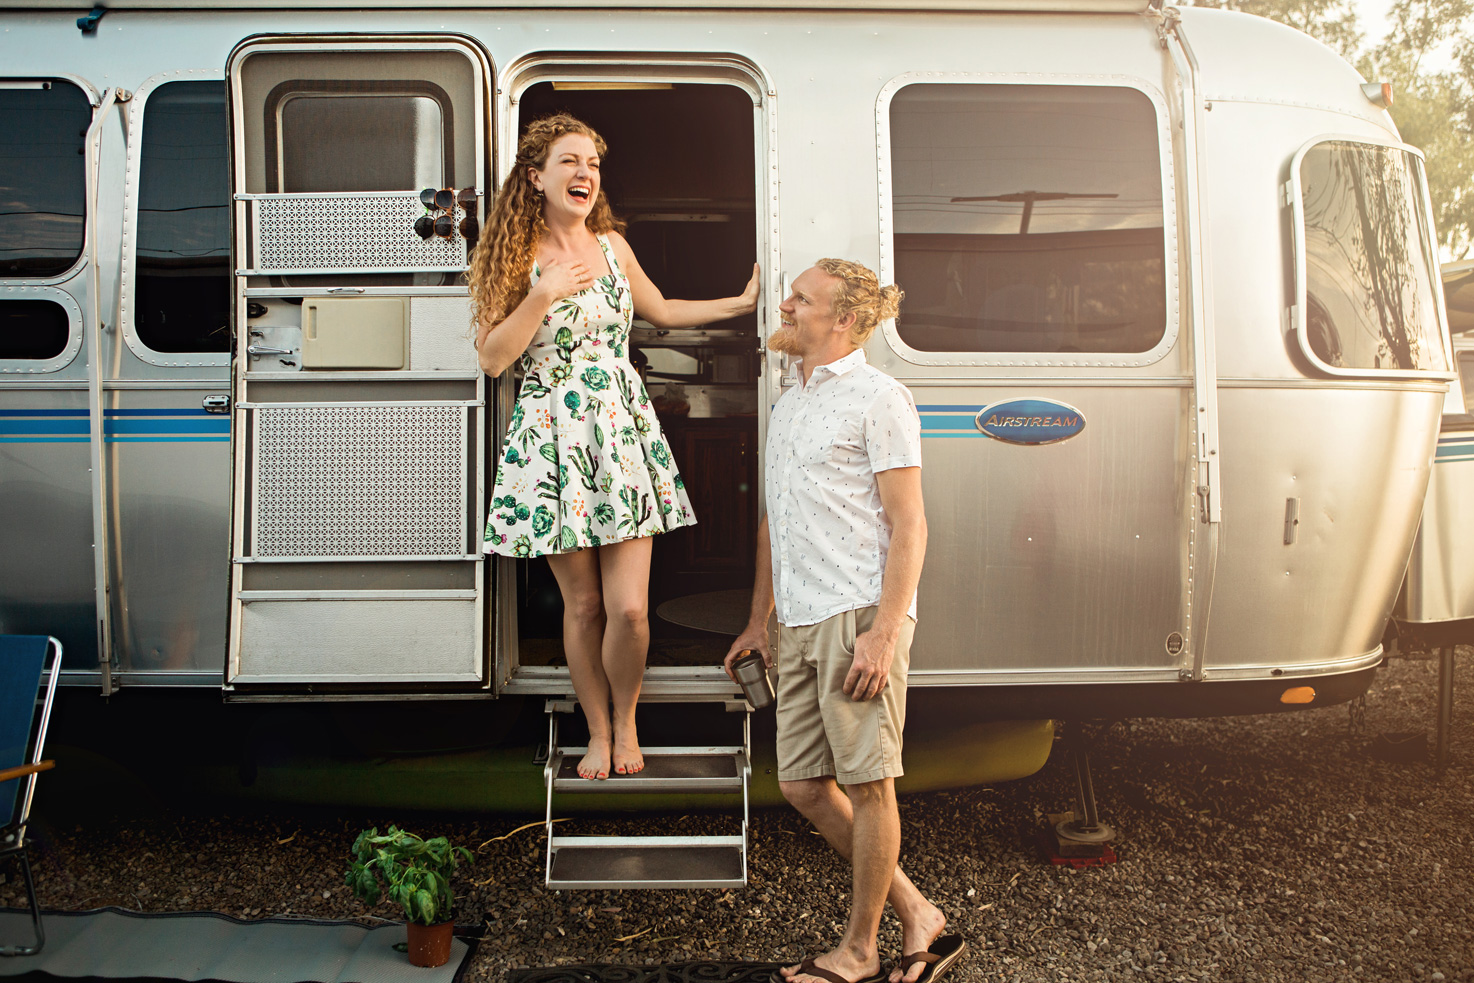 CindyGiovagnoli_Tucson_Arizona_engagement_lifestyle_portrait_Airstream_Excella_travel_trailer_camper_Saguaro_National_Park-057.jpg